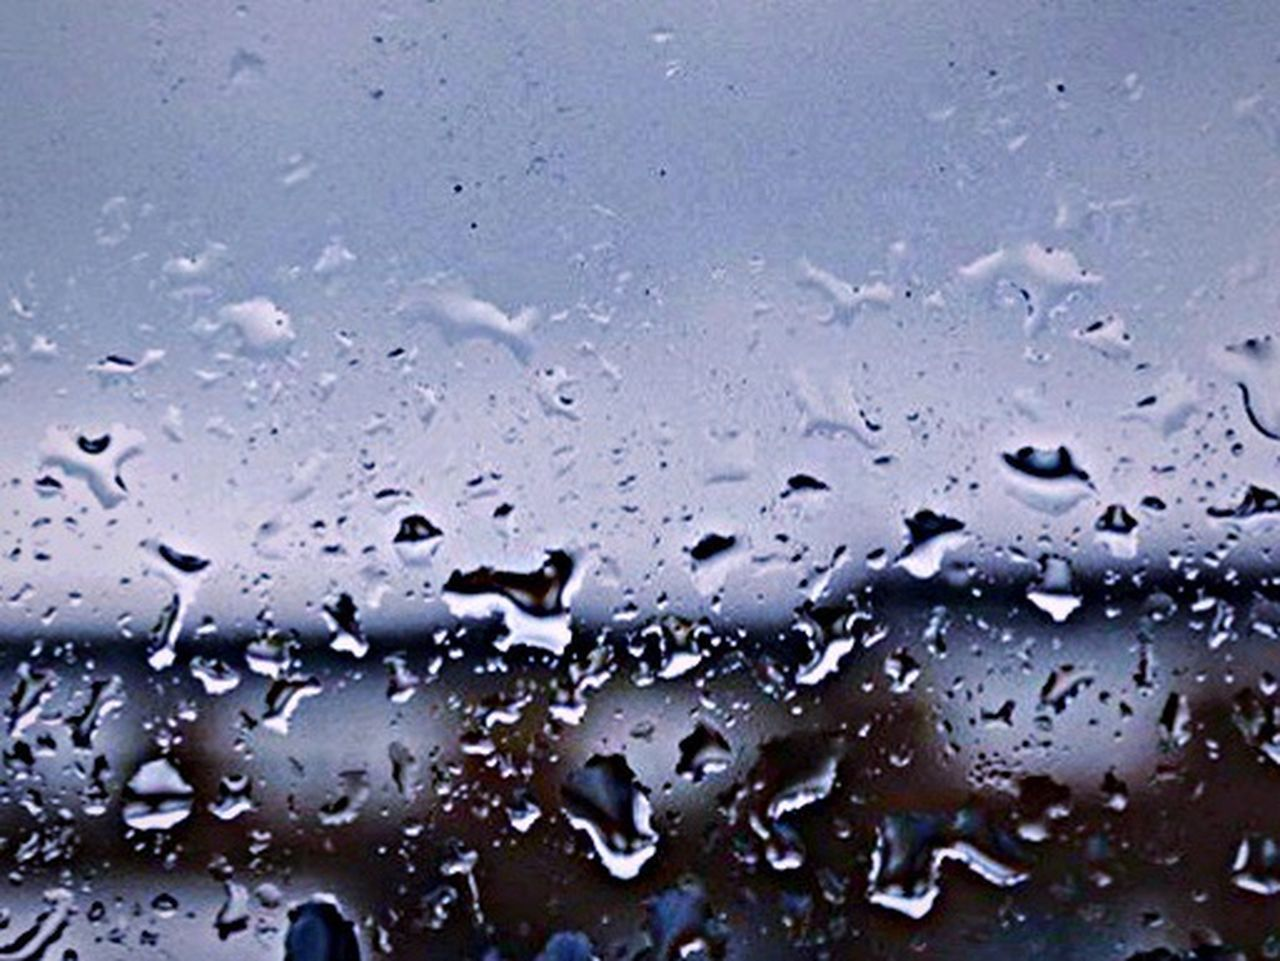 Rainy Days Rain Windowraindrops Raindrops